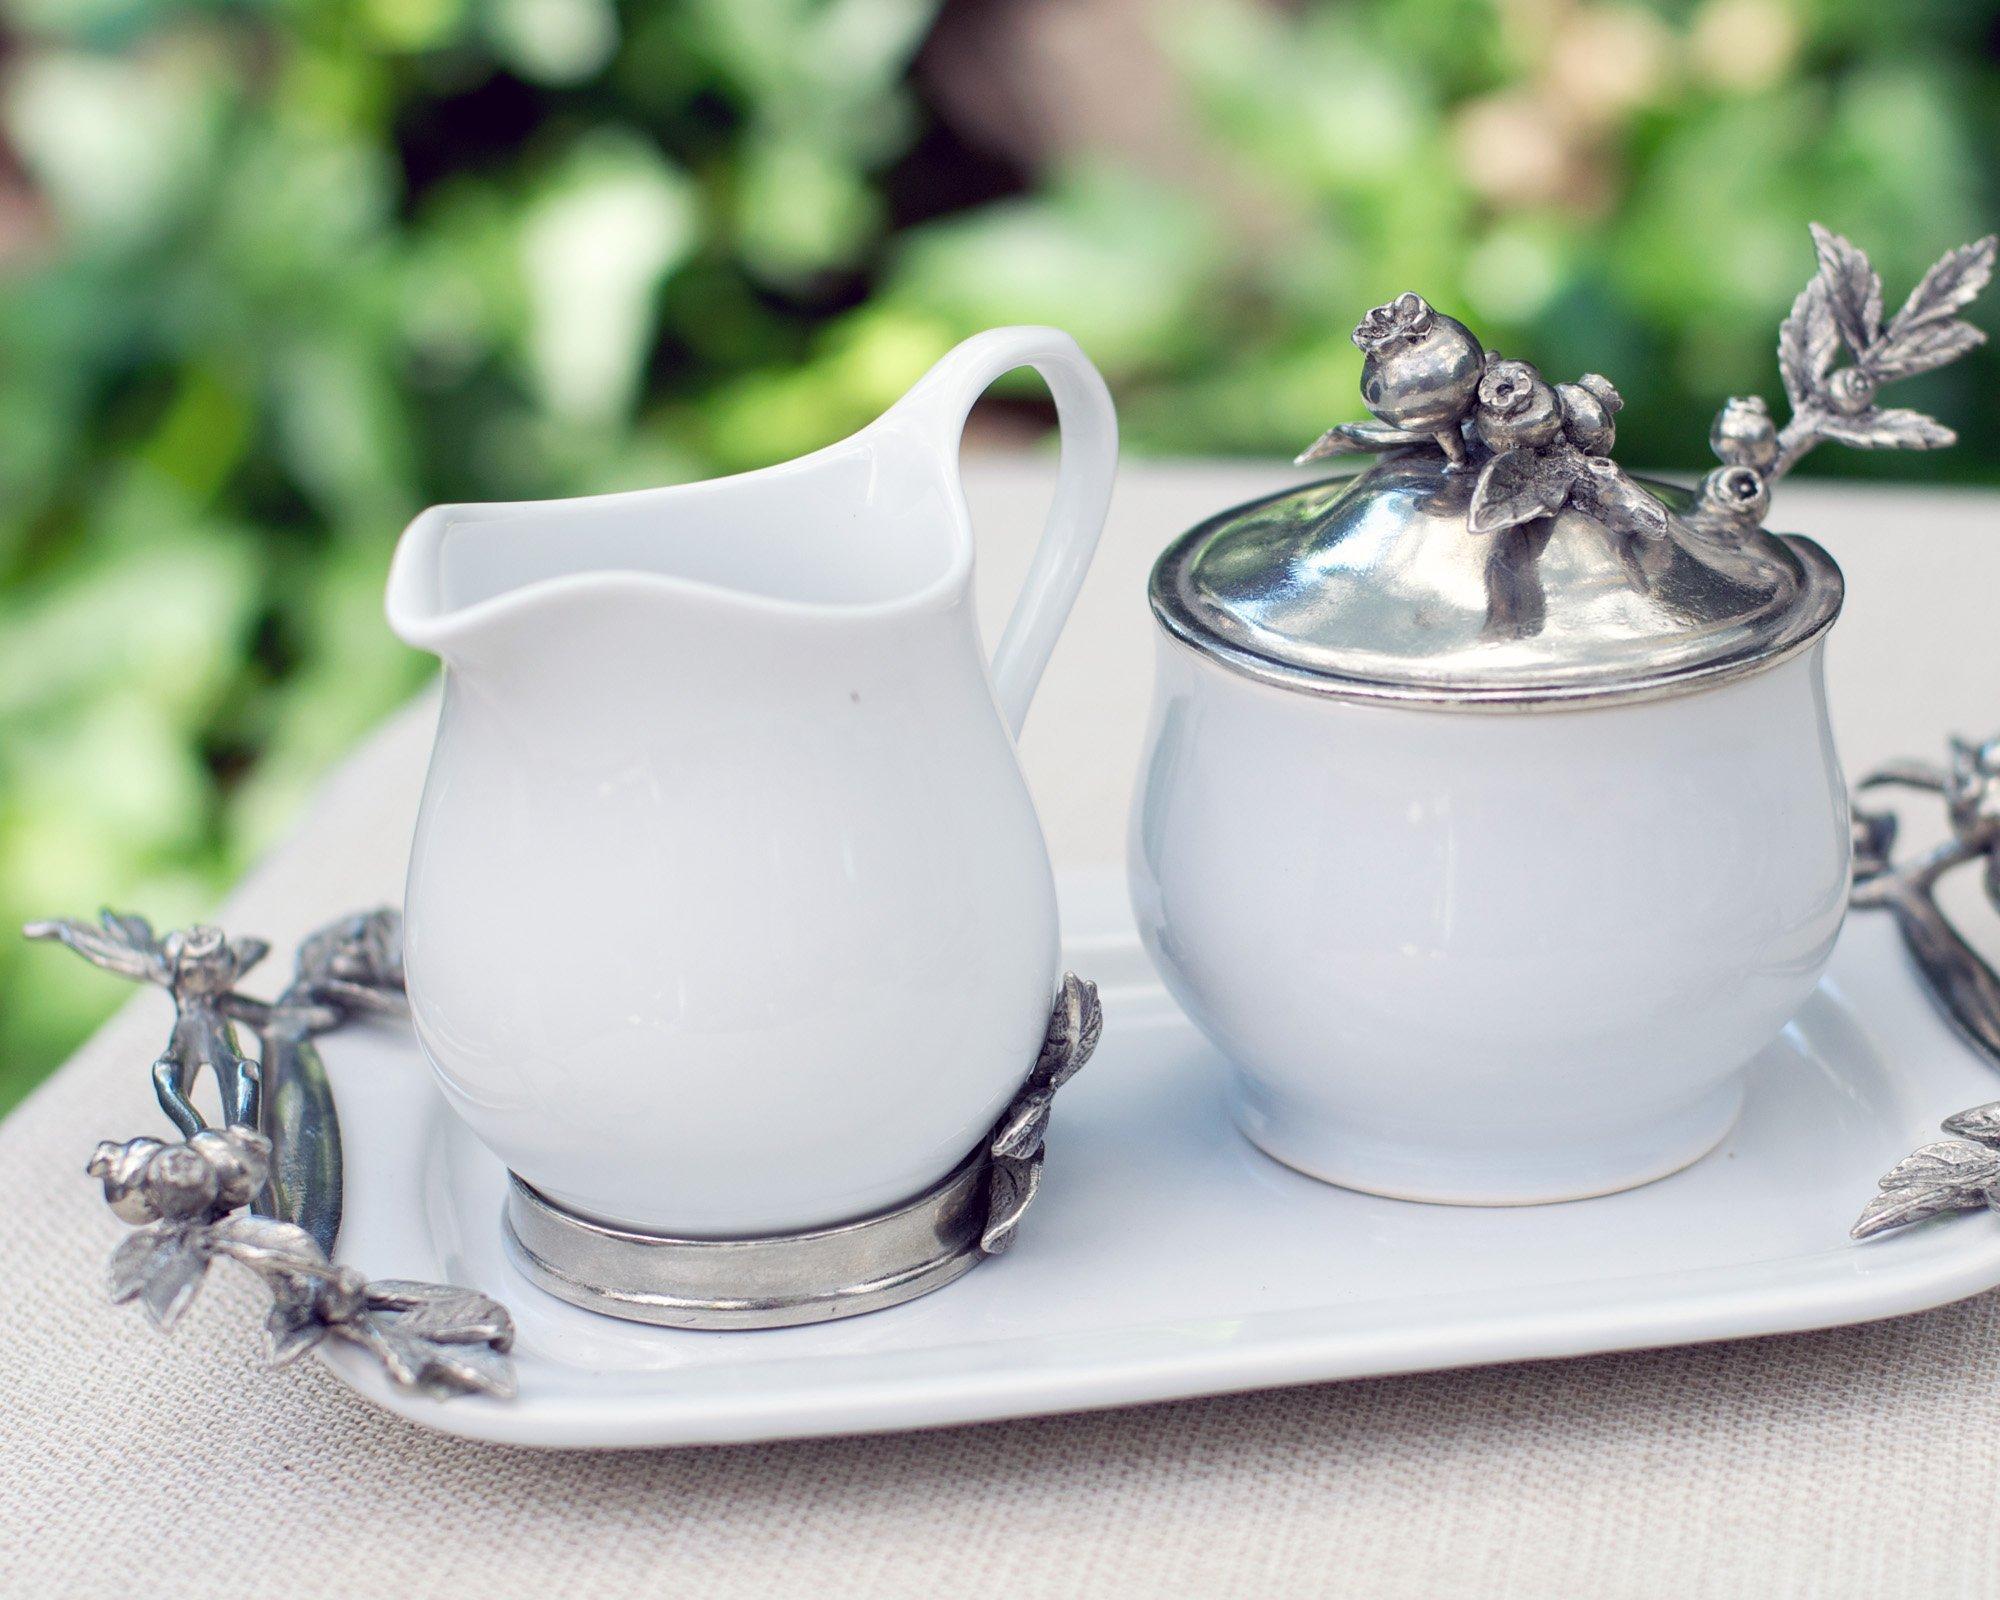 Vagabond House Stoneware Creamer Set - Pewter Blueberry 12.25'' Long